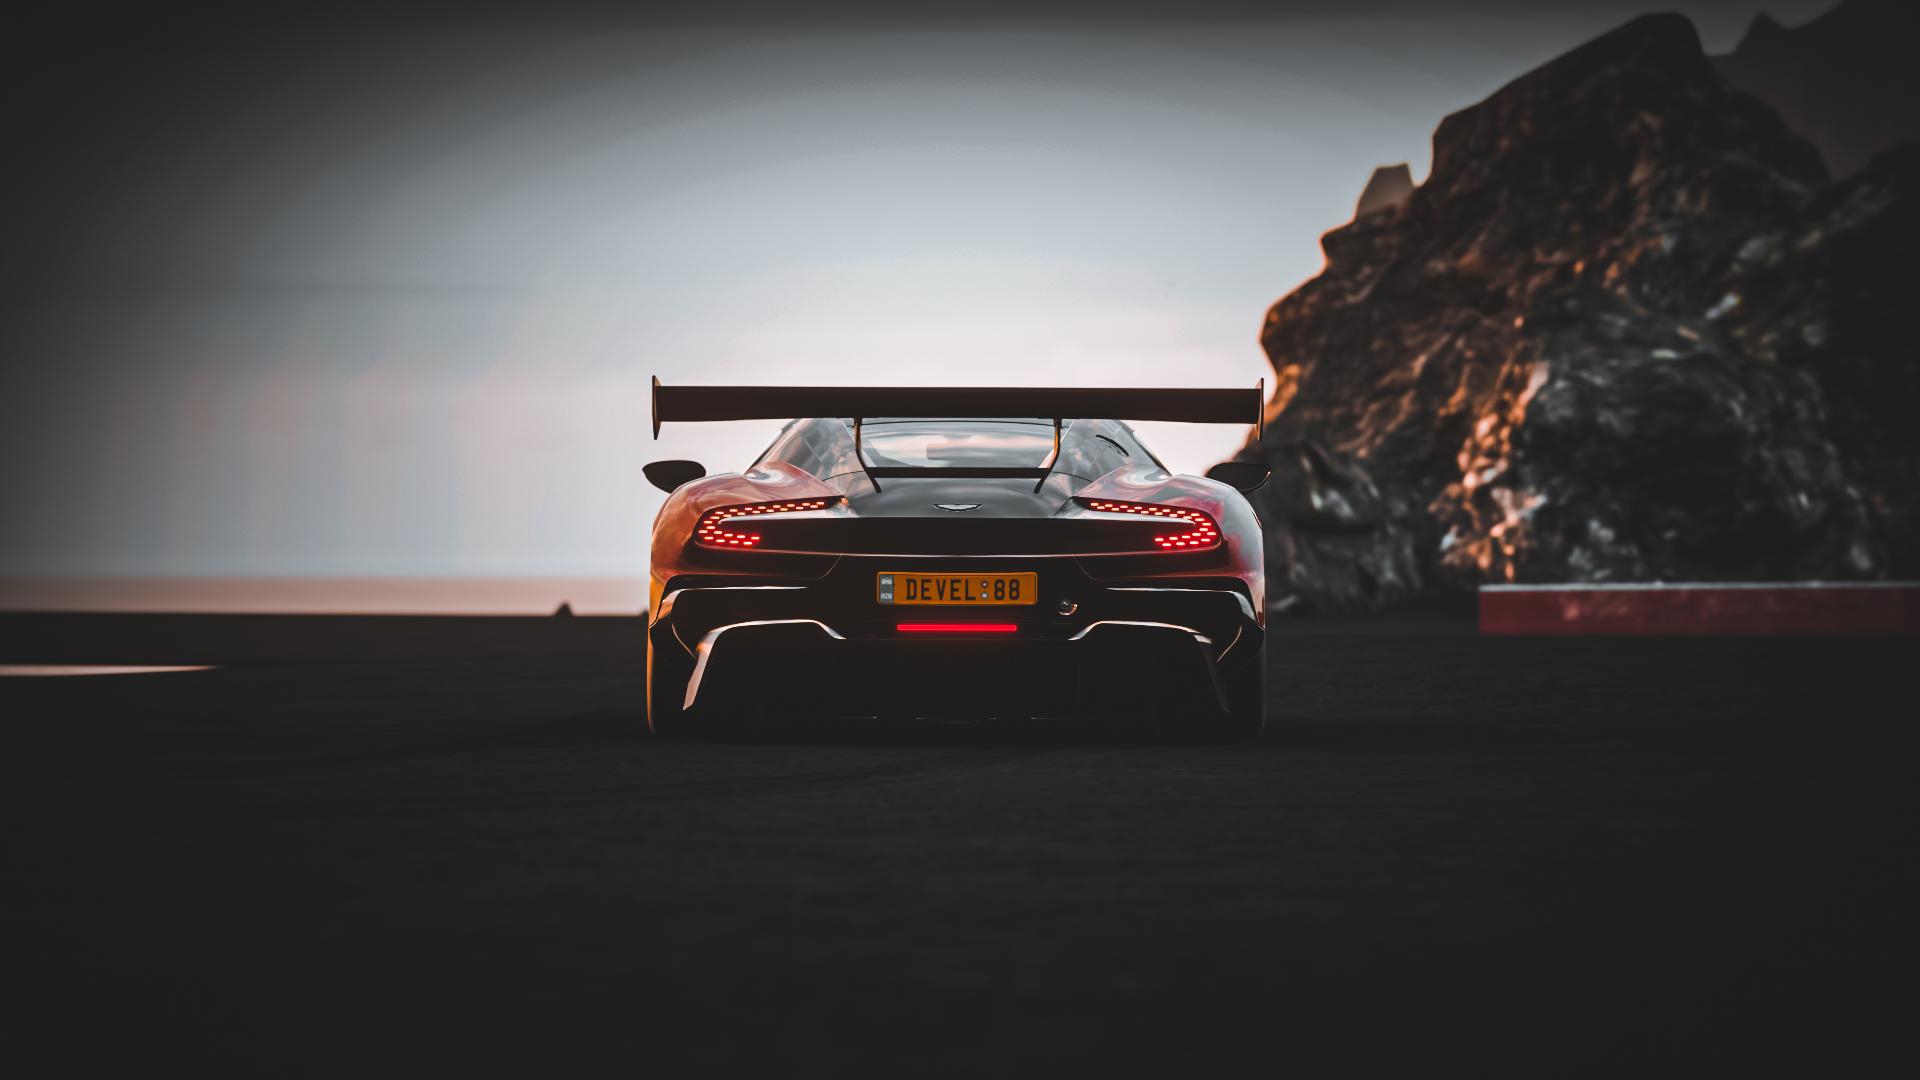 Wallpaper Aston Martin Aston Martin Vulcan Car Video Games Forza Horizon 4 1920x1080 Scyther149 1794991 Hd Wallpapers Wallhere